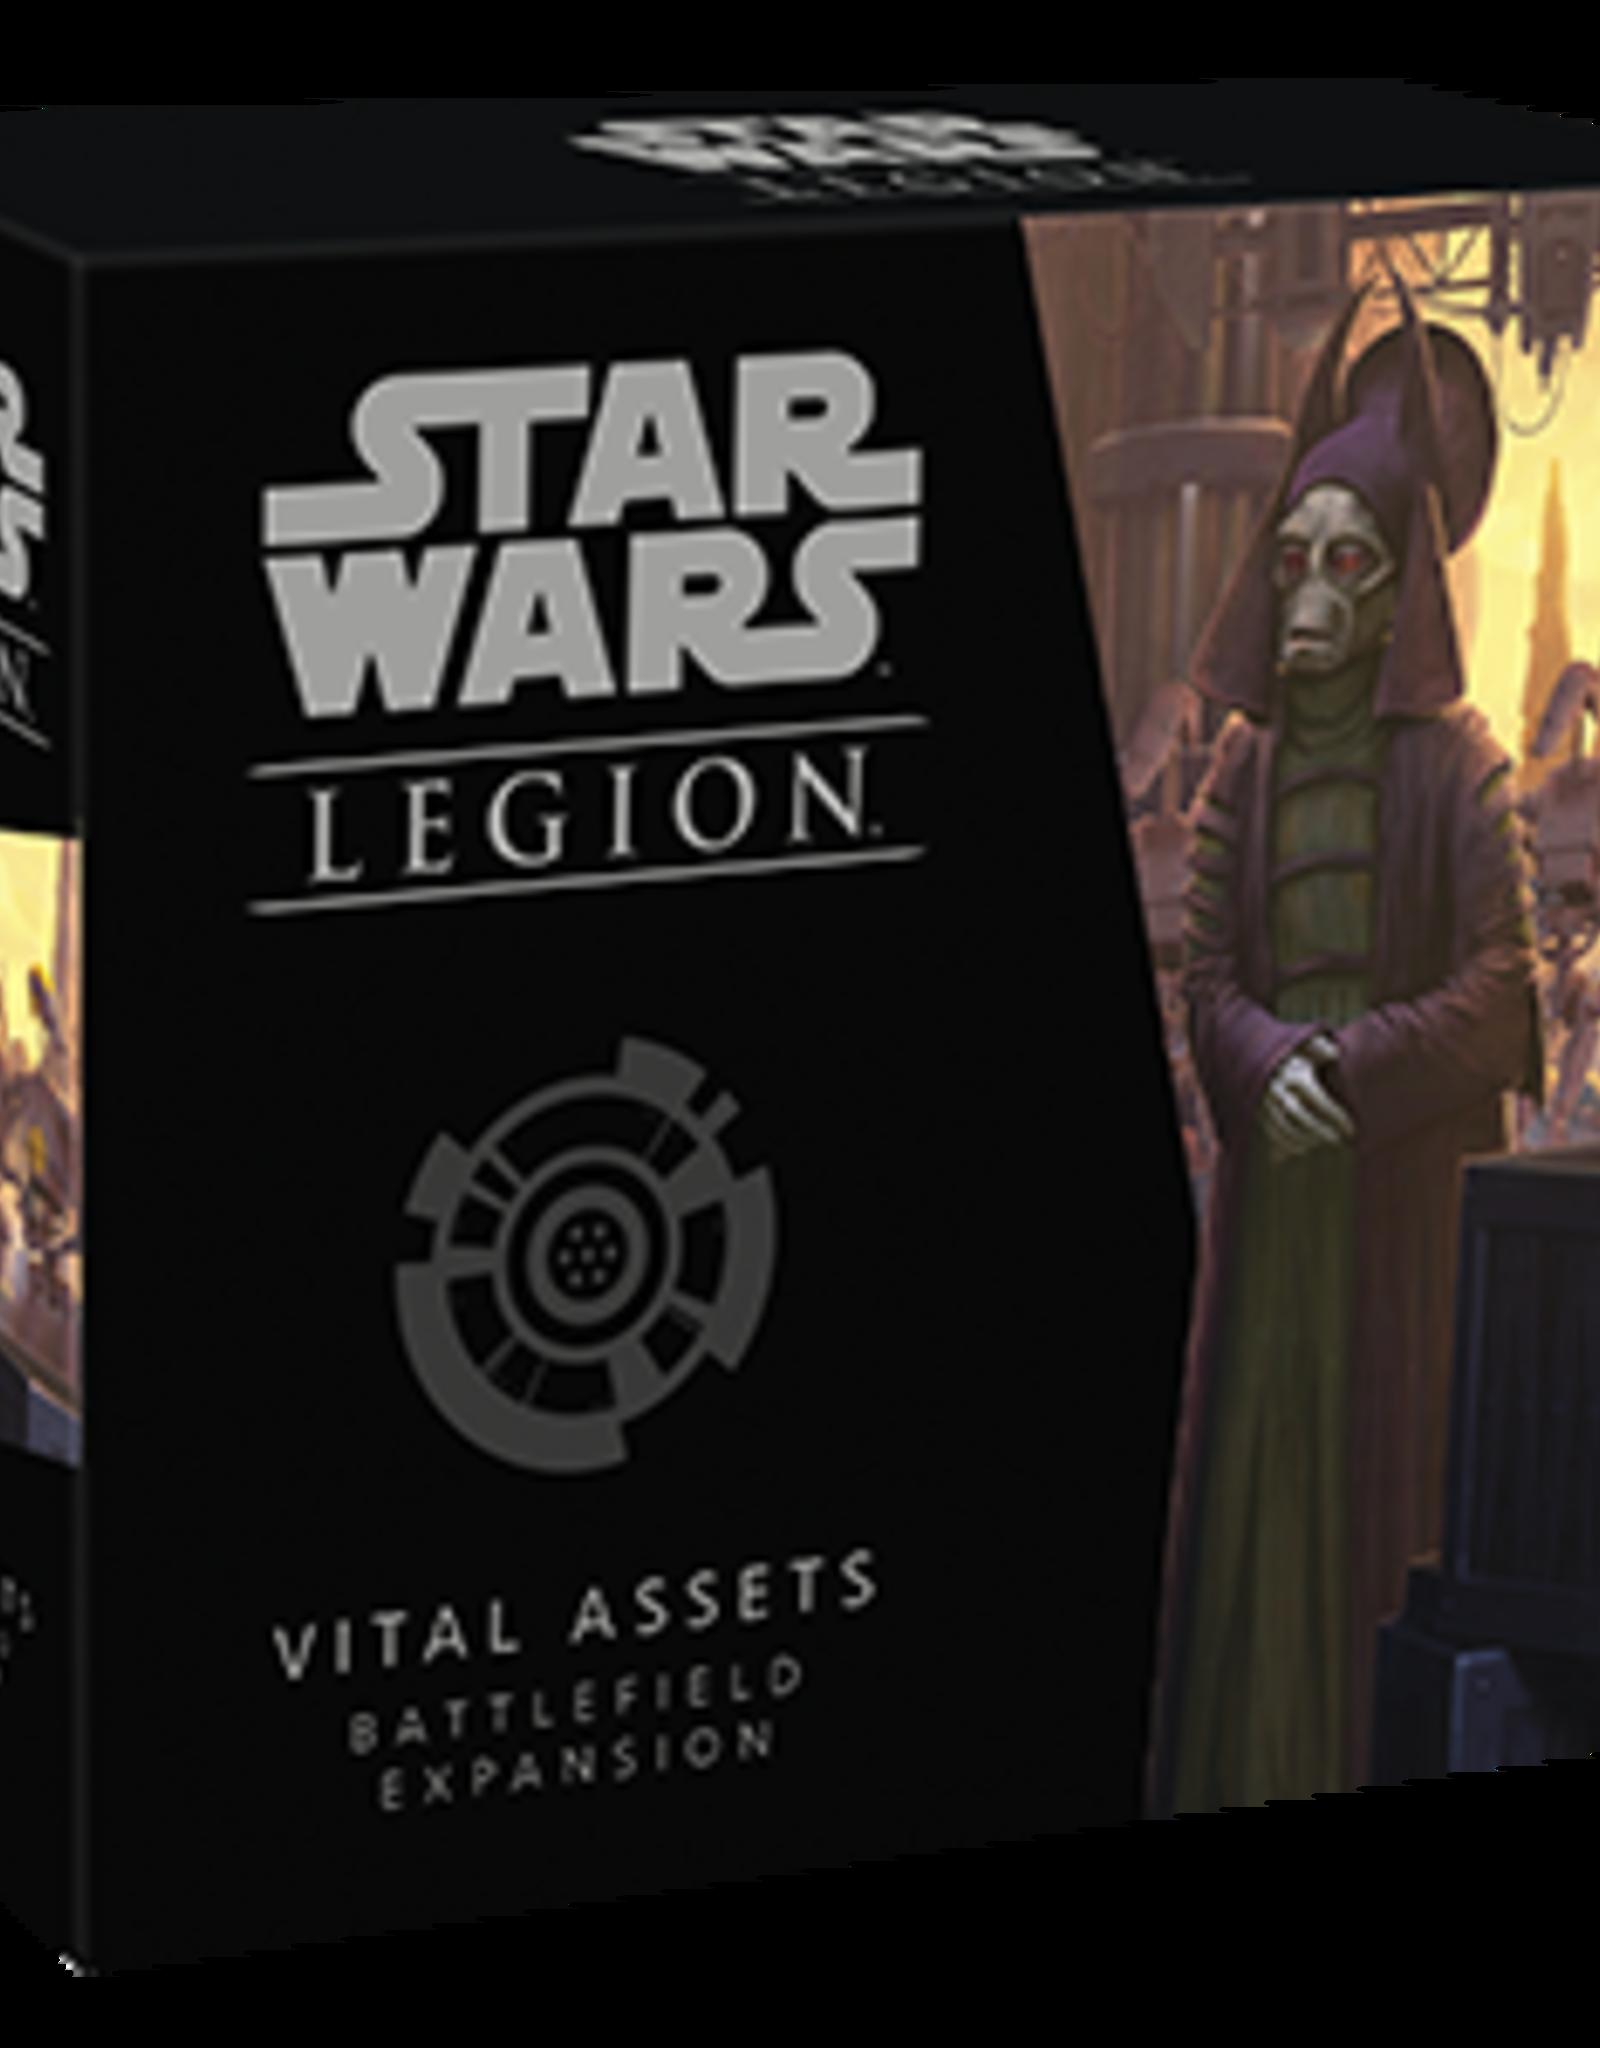 FFG Star Wars Legion: Vital Assets Battlefield Expansion